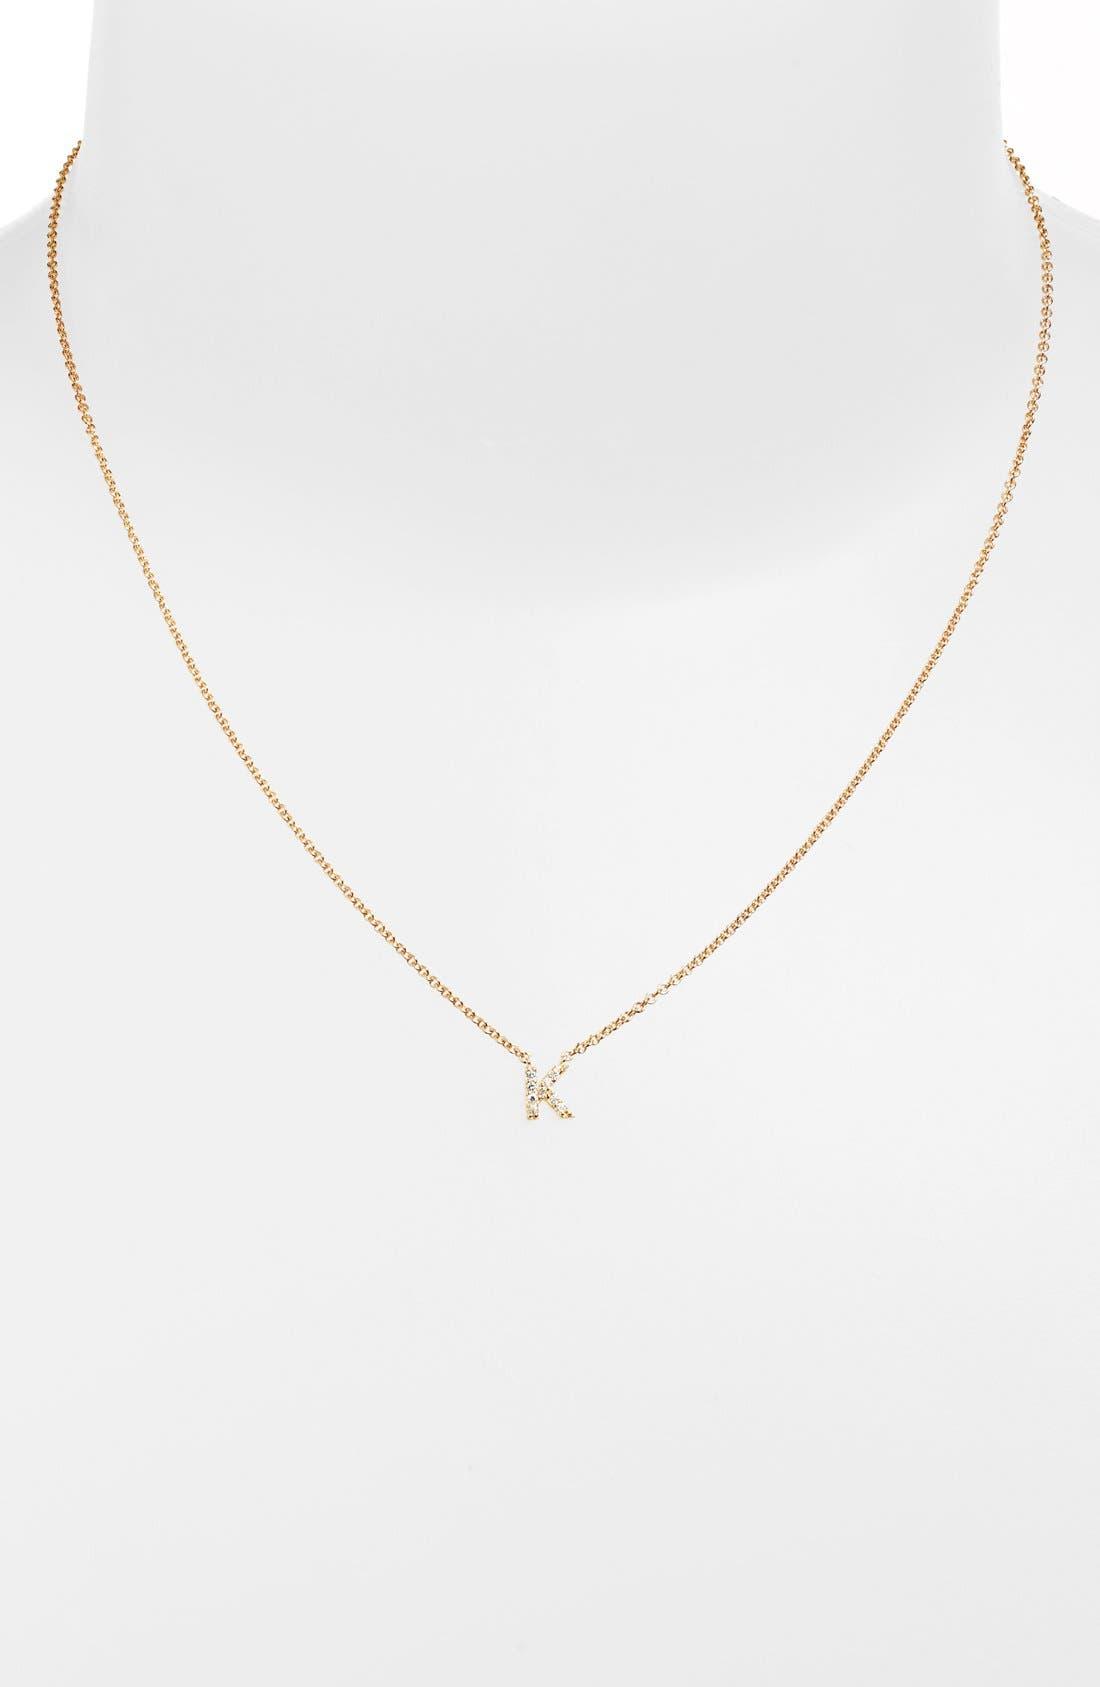 Main Image - Sugar Bean Jewelry 'Initial' Pendant Necklace